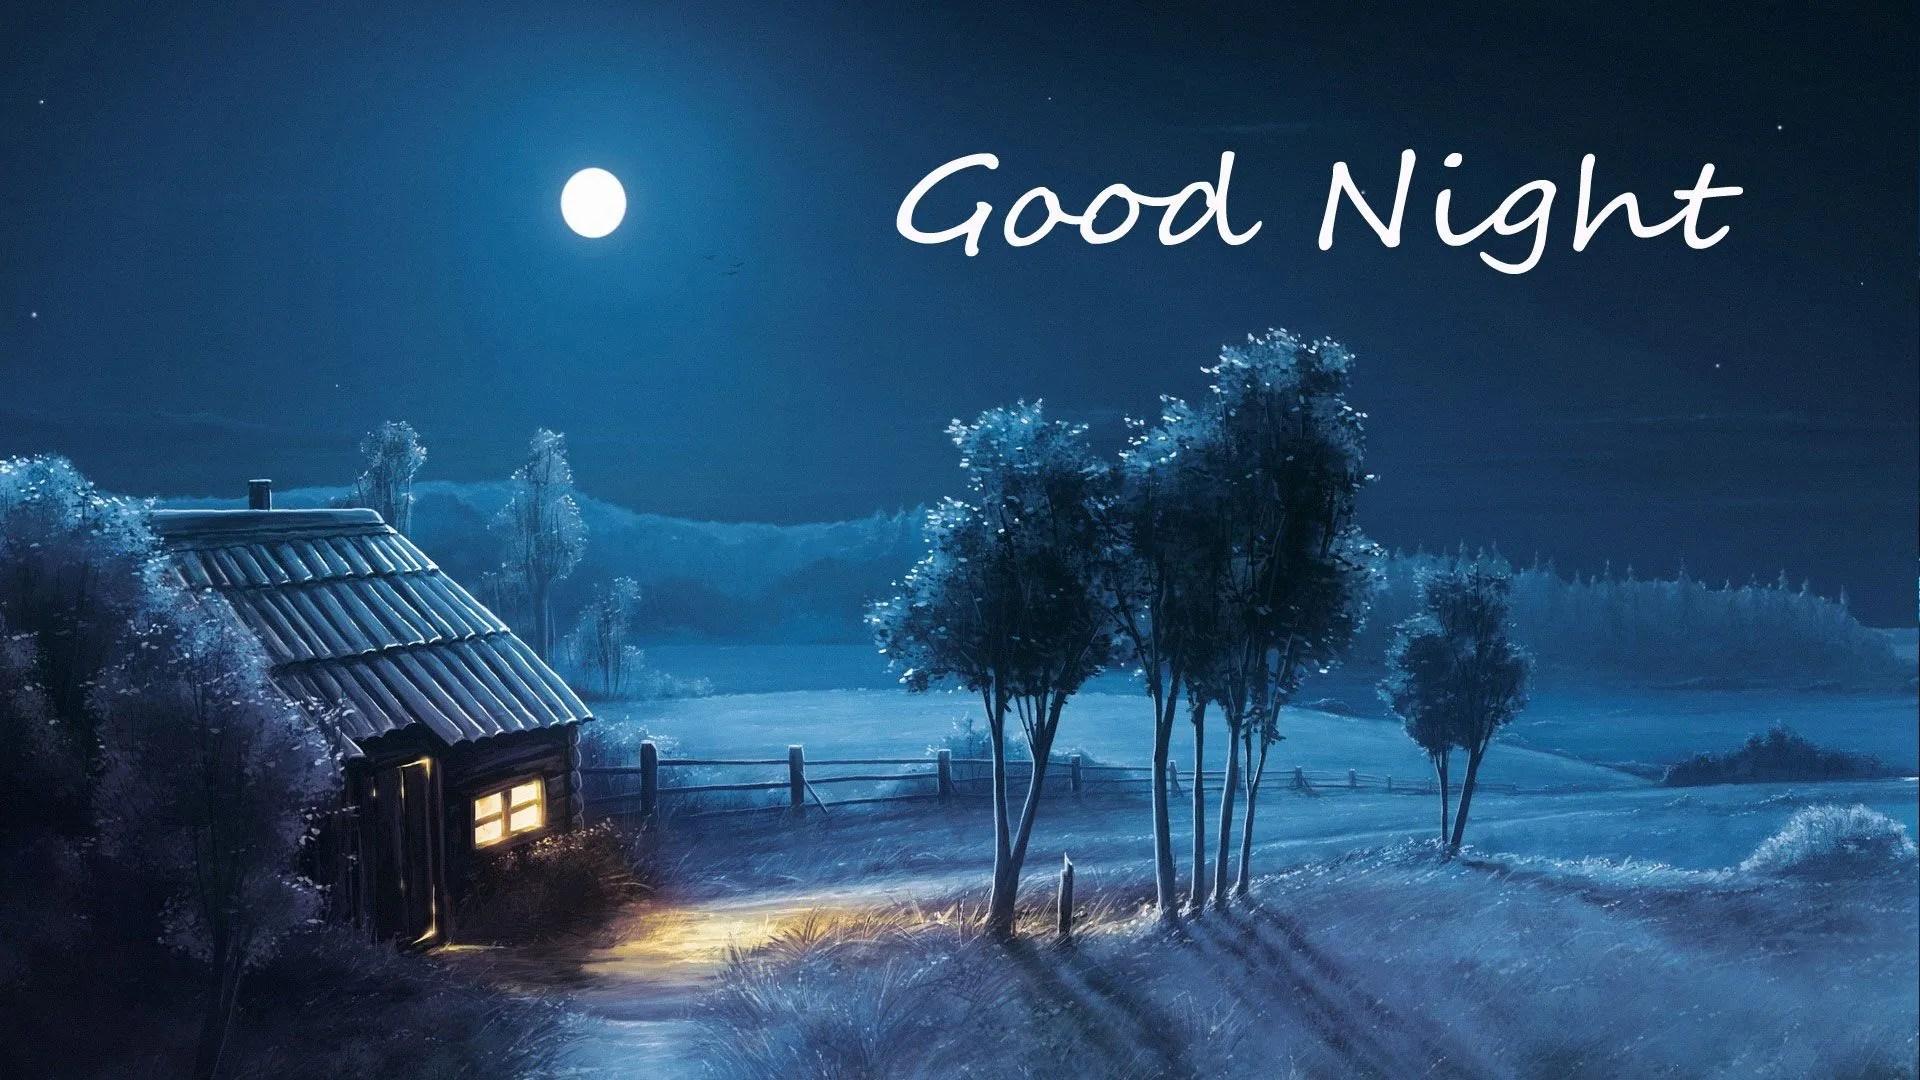 Good night home moon image